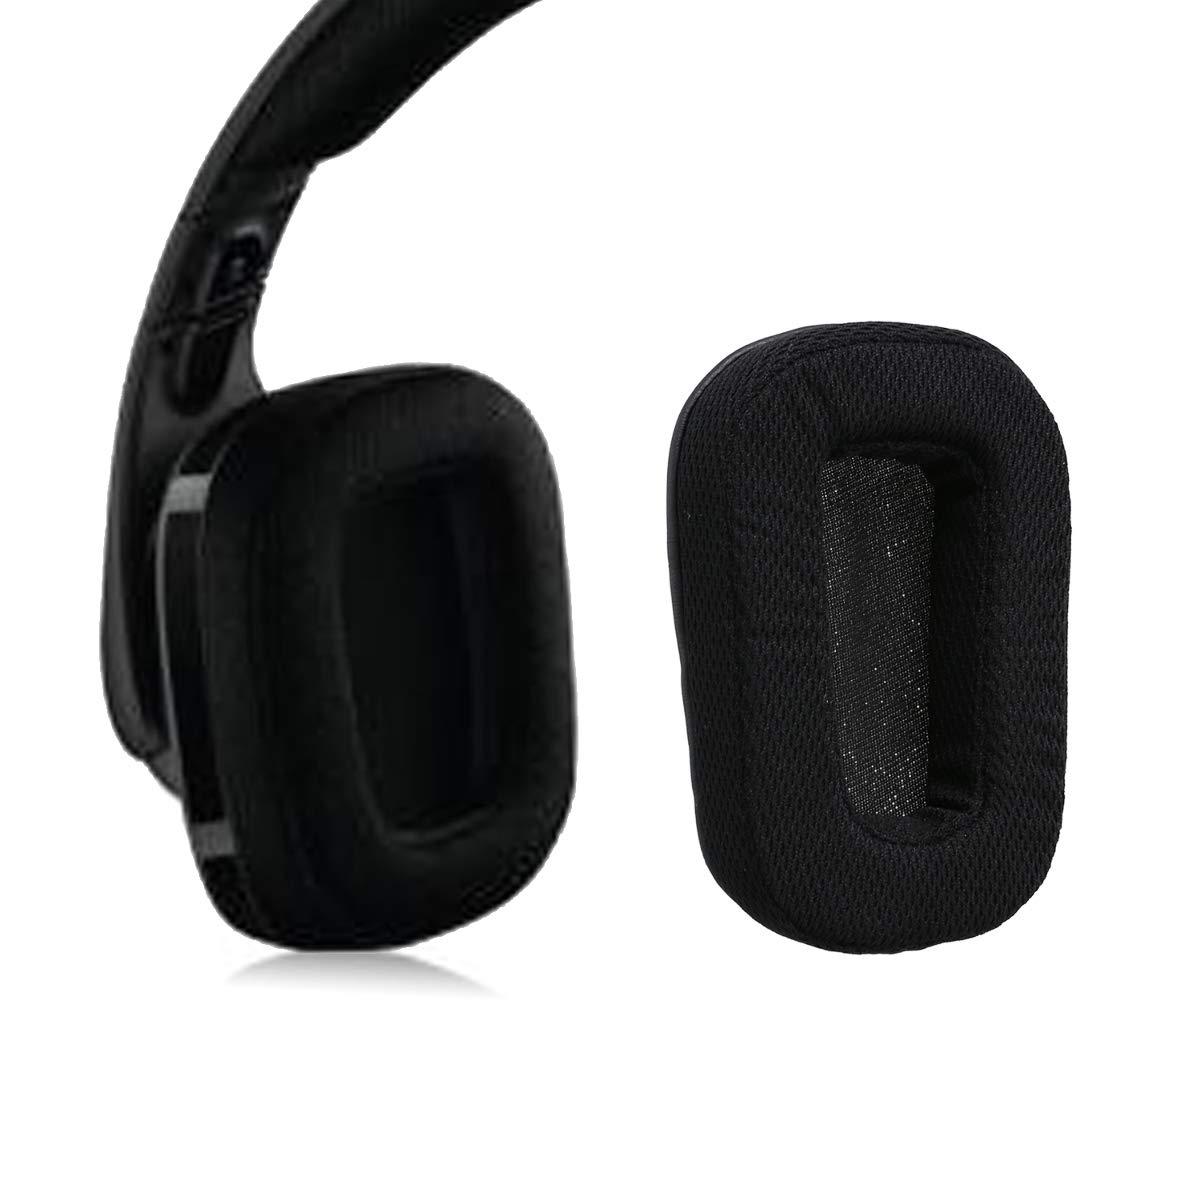 Nicecool/® Ear Pads auricolari di ricambio per Logitech G933/G633/Artemis Spectrum Surround Gaming Headset cuffie da orecchio Pad//orecchio cuscino//coppe//orecchio copertura